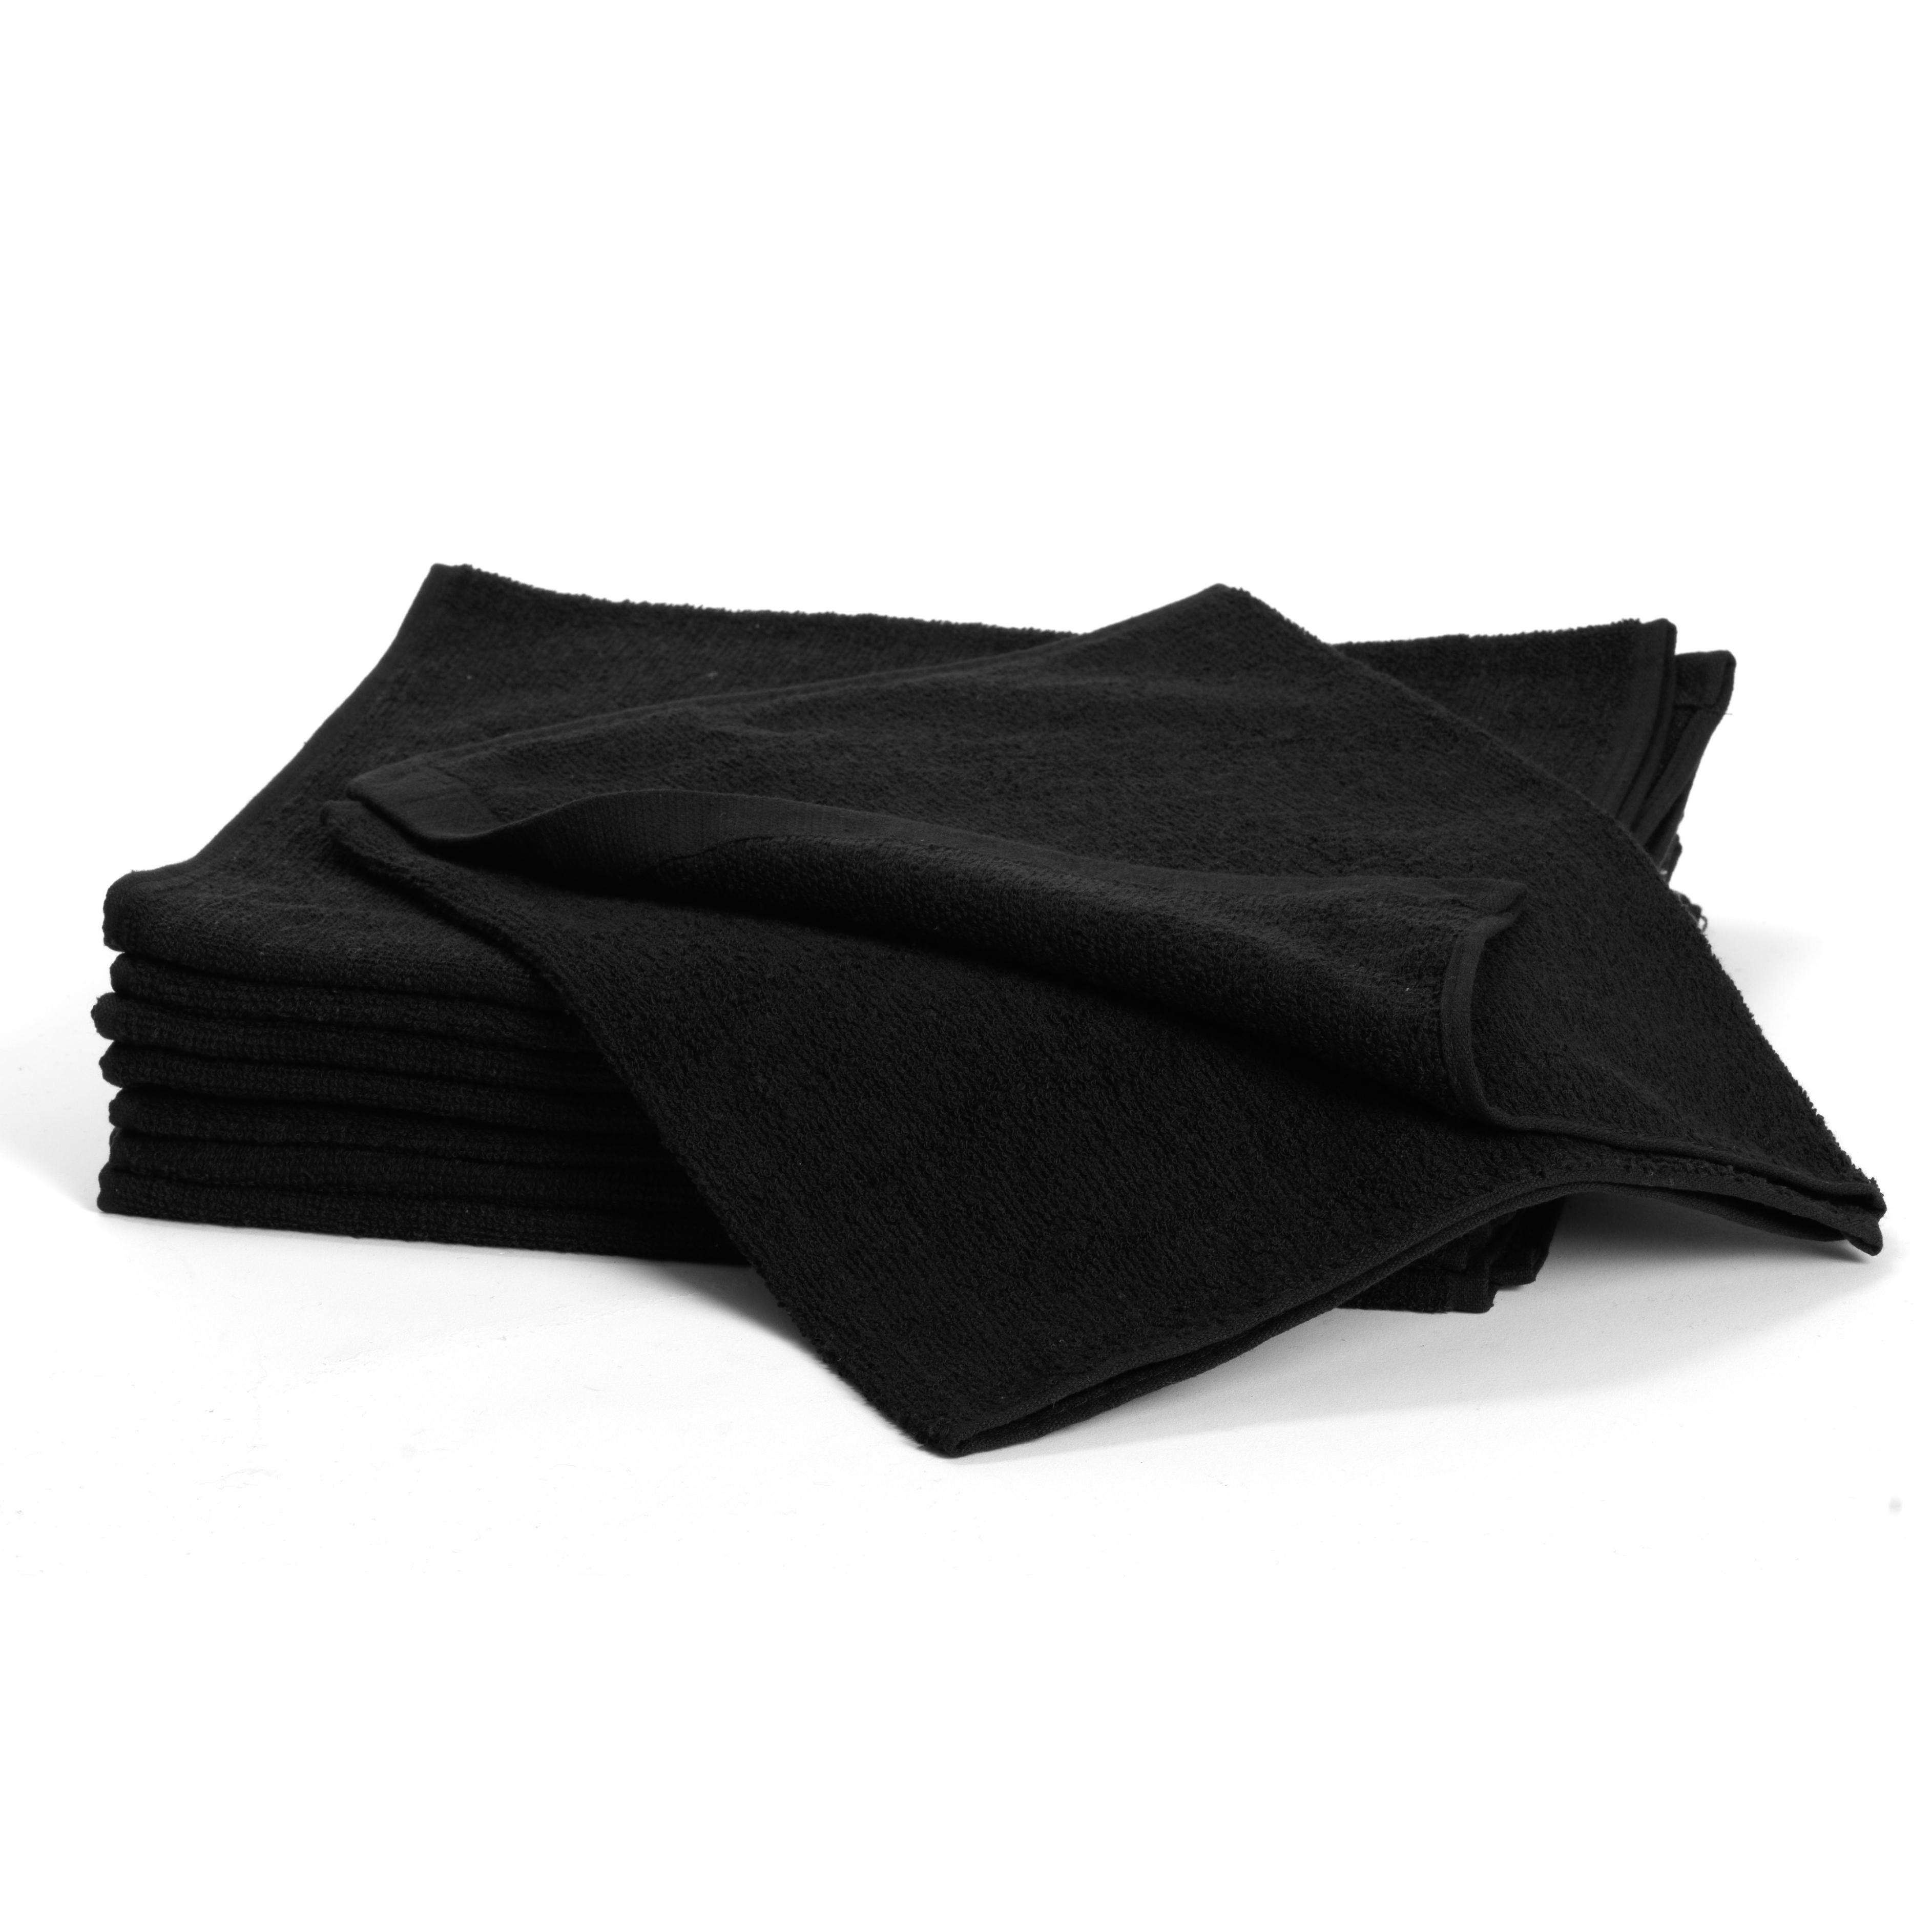 Cotton Towels, black 5097 - bavlnený uterák, čierny, 34 x 82 cm, 1 ks